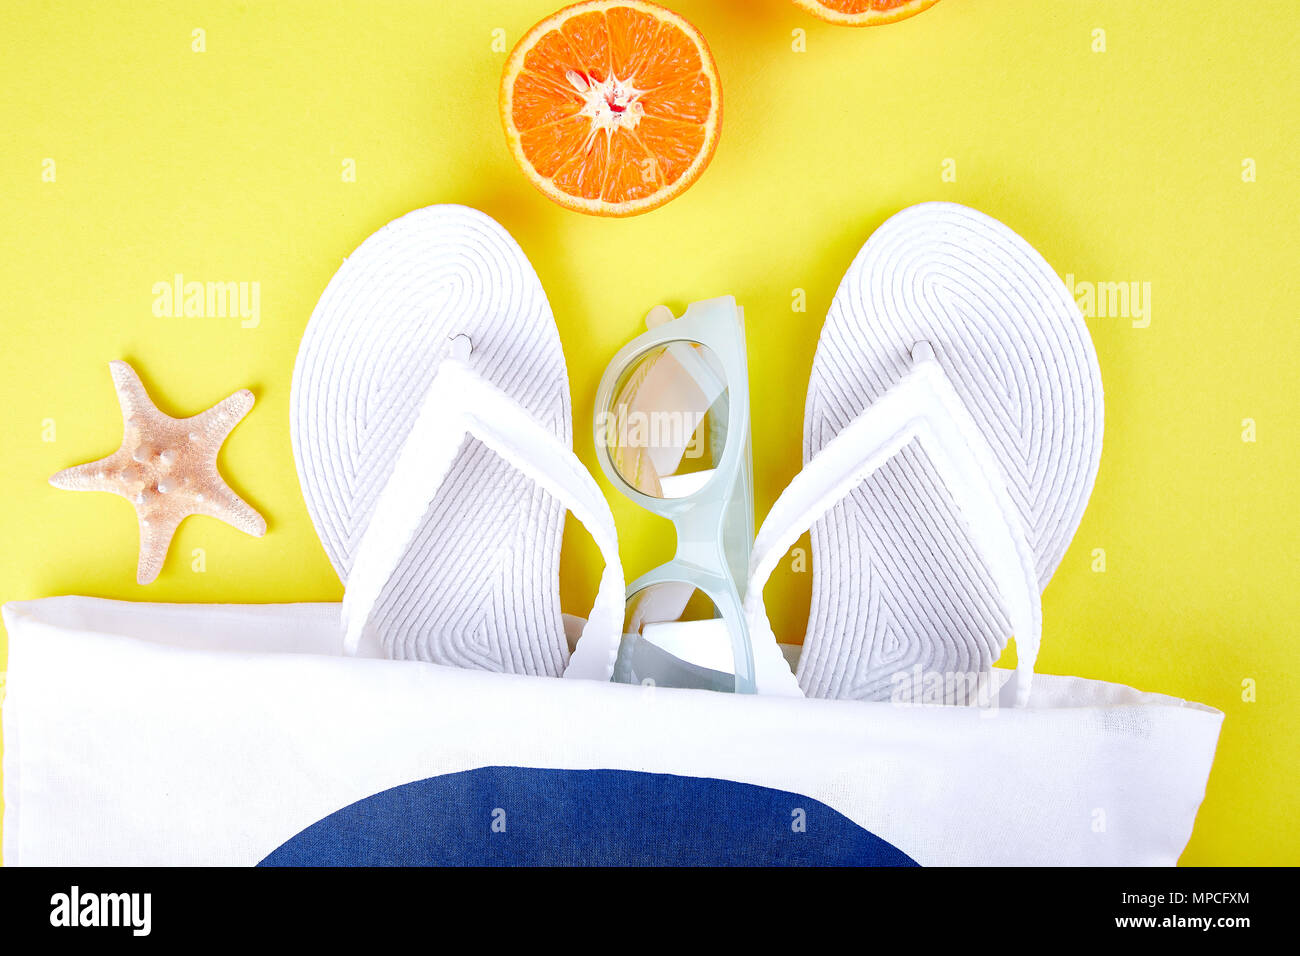 477e22d63d425 Orange Flip Flops Stock Photos   Orange Flip Flops Stock Images - Alamy